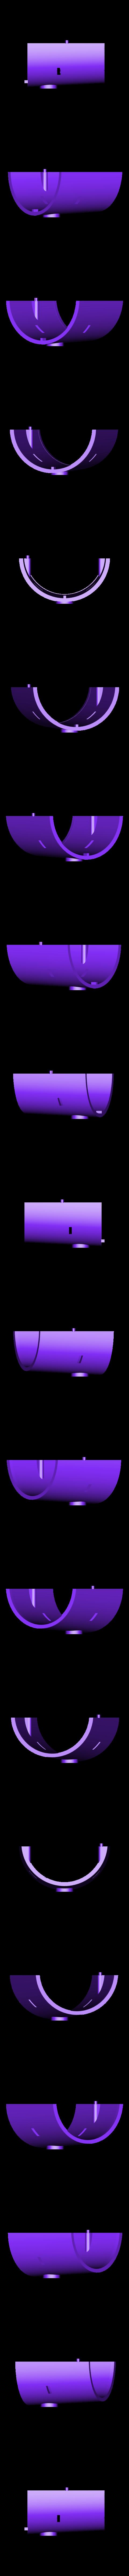 Smoke_Box_-_Part_1-.STL Download free STL file 4-8-8-4 Big Boy Locomotive • 3D printer object, RaymondDeLuca